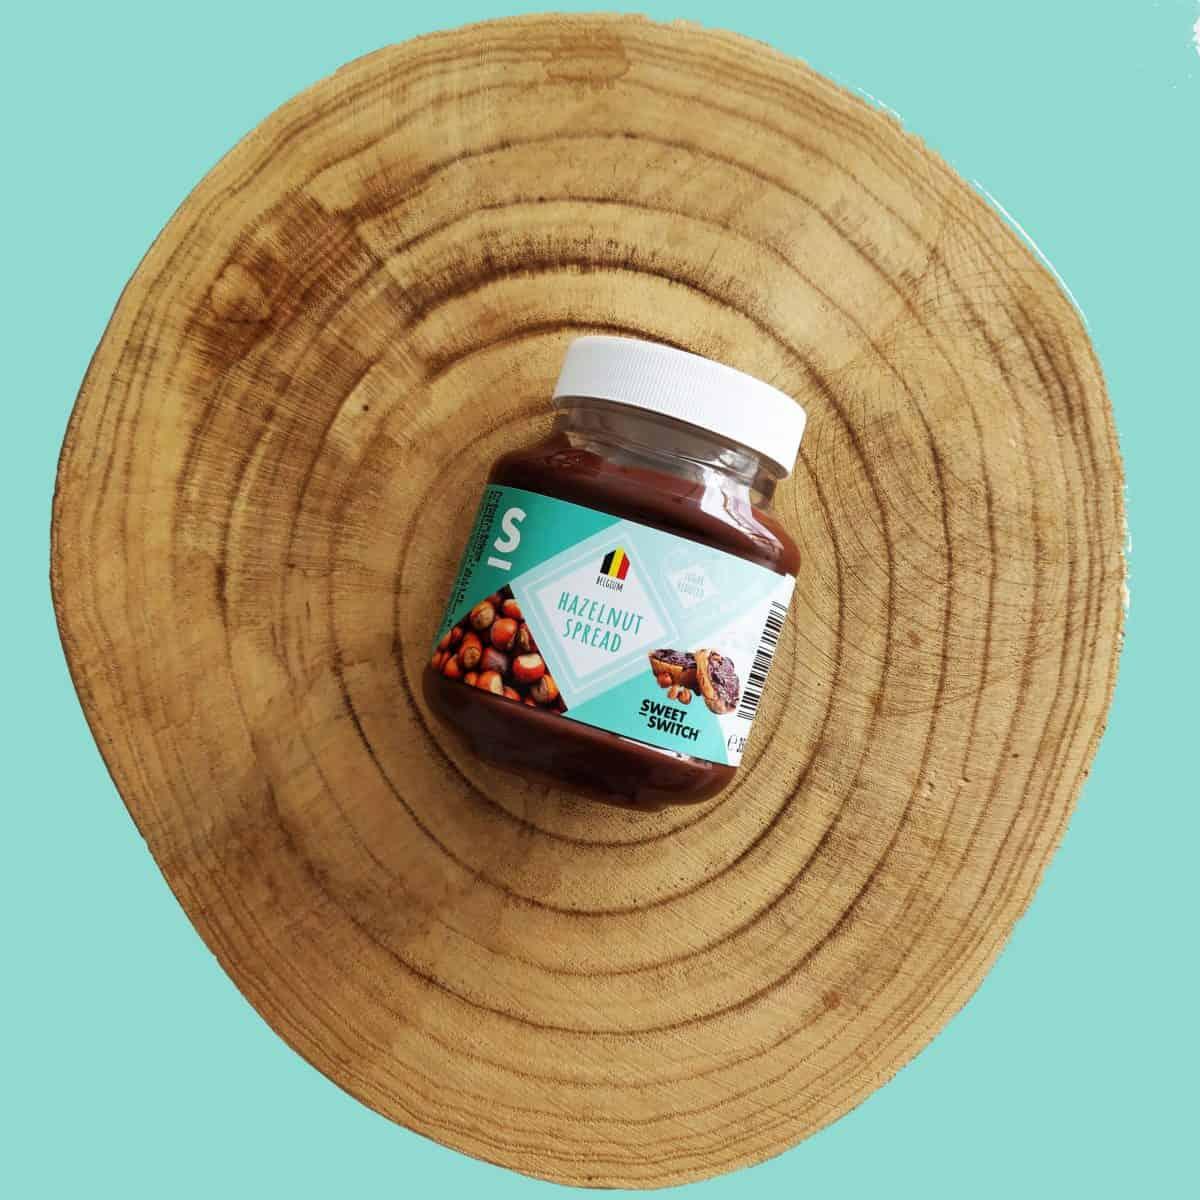 sugar free confectionery heaven SWEET-SWITCH hazelnut spread